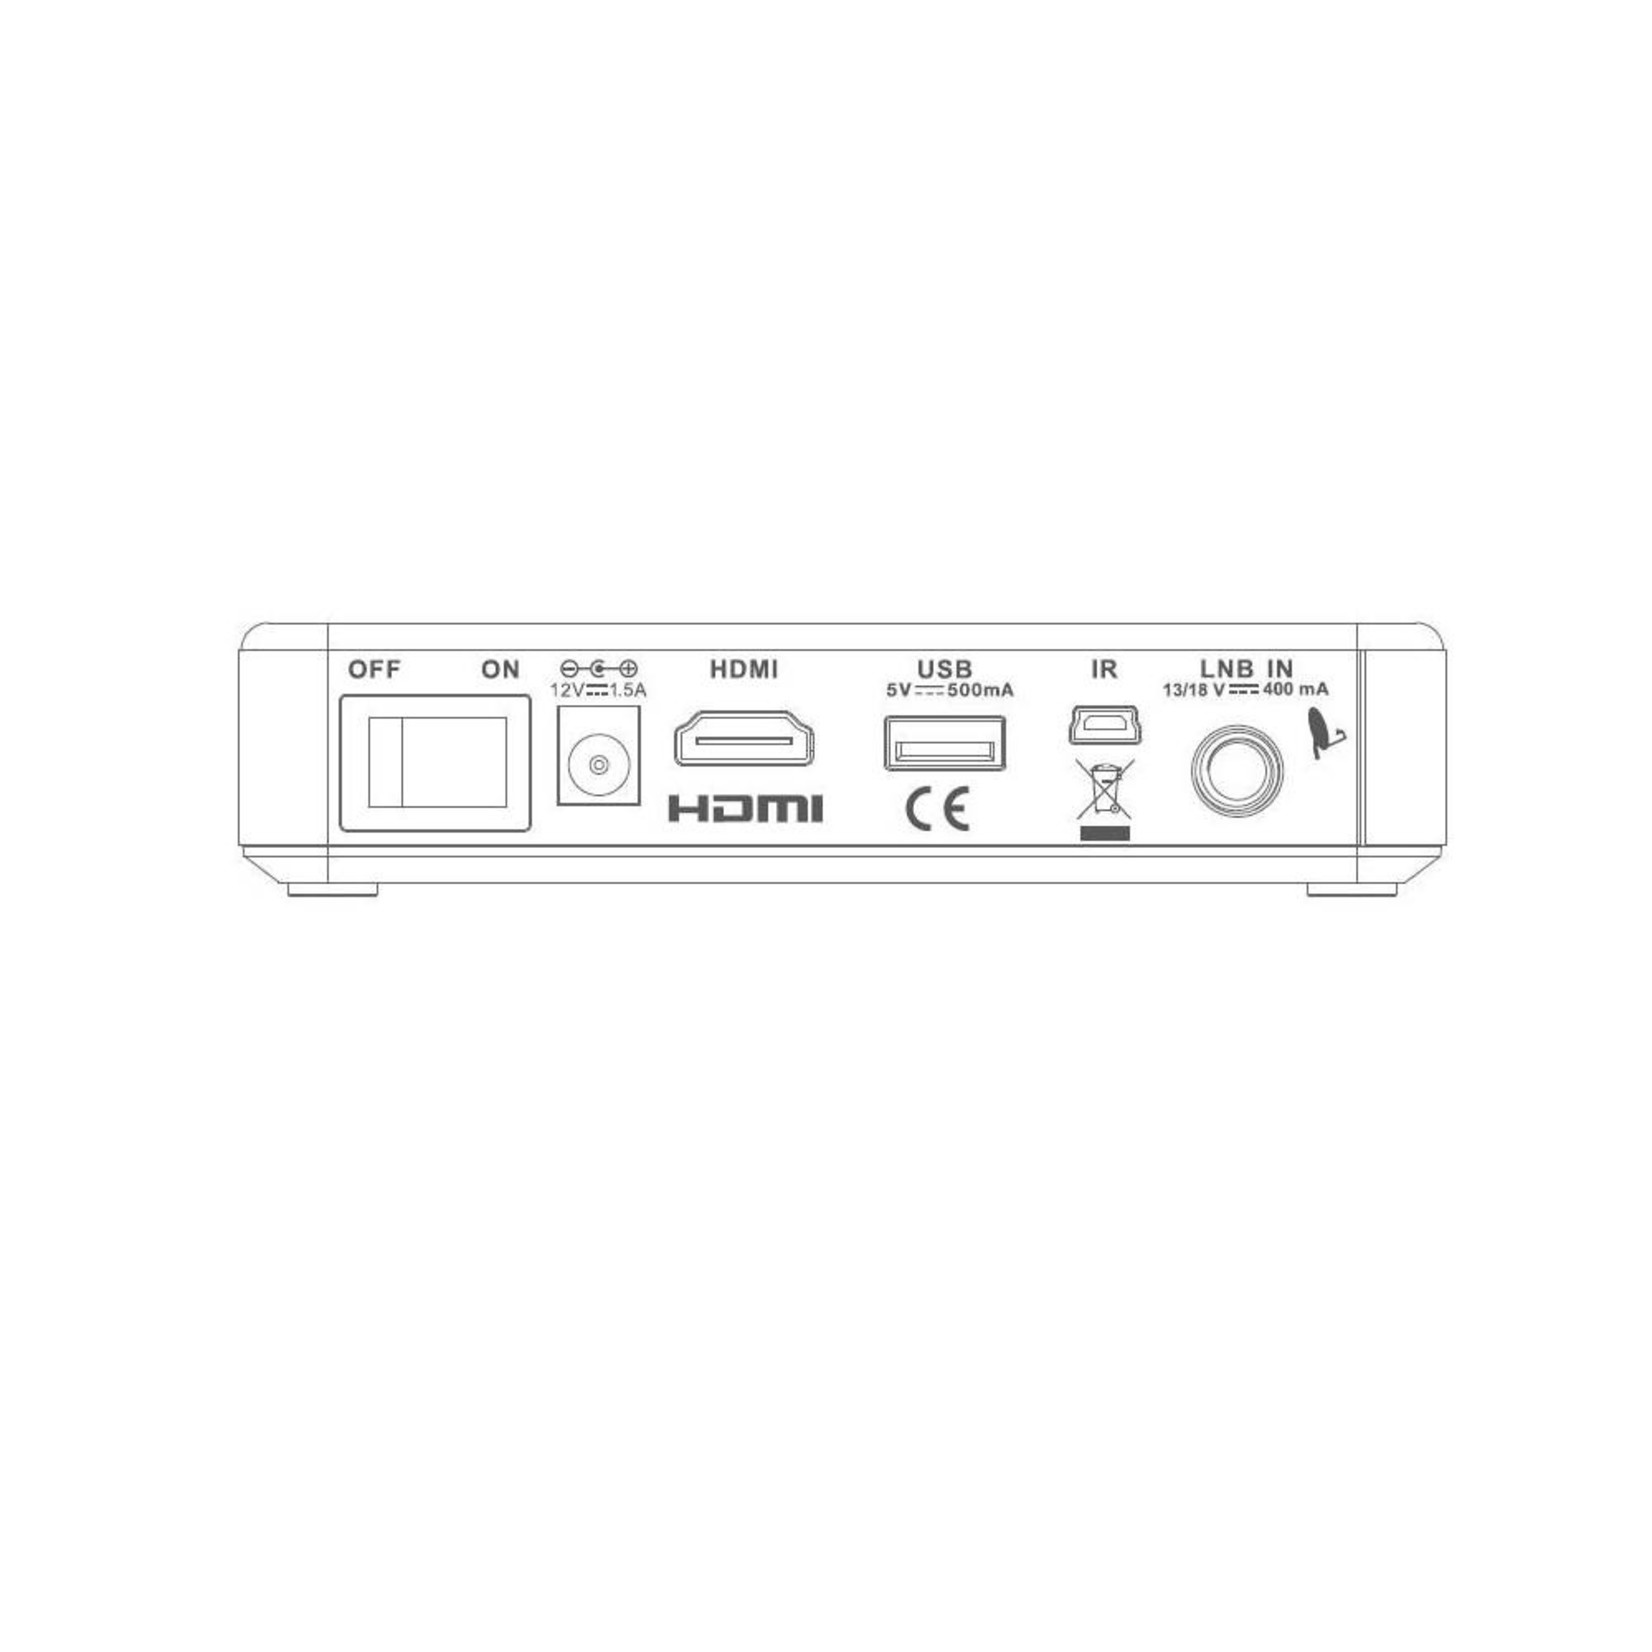 DENSON ONTVANGER DENSON DS1010 MINI V2,HD,CI+,H265, 12VDC/230VAC